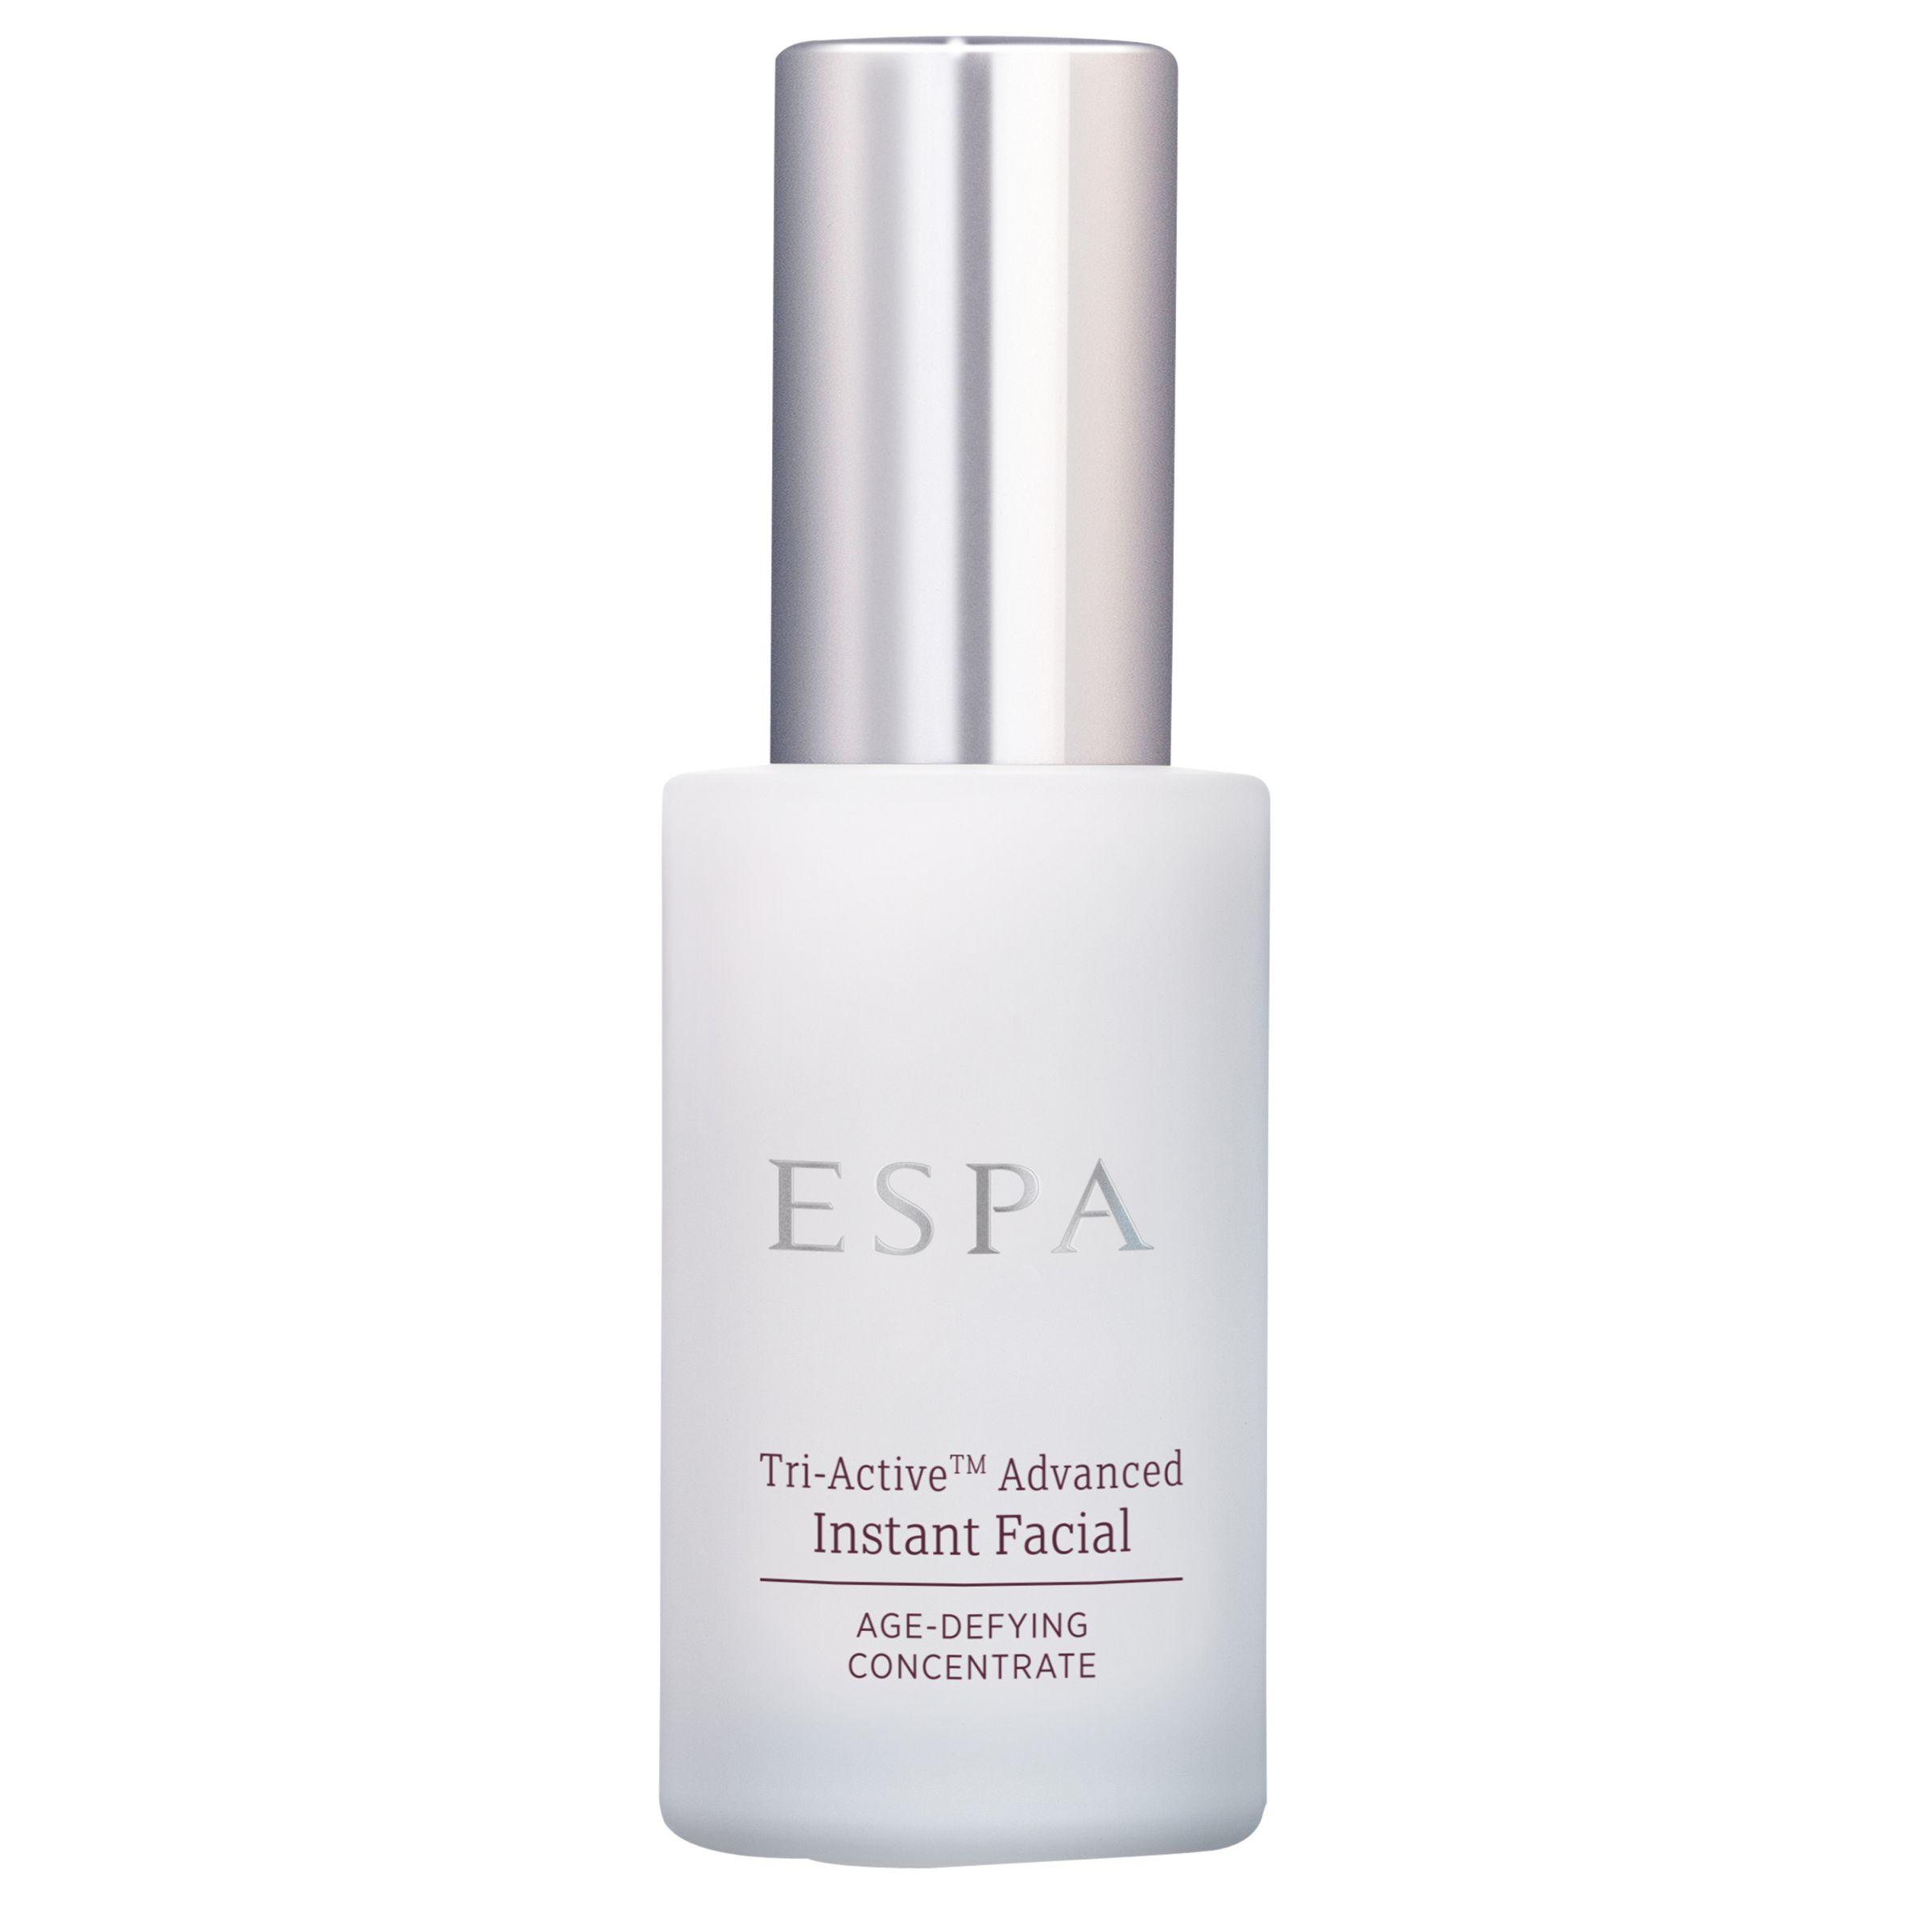 ESPA ESPA Tri-Active Advanced Instant Facial Age-Defying Concentrate, 30ml